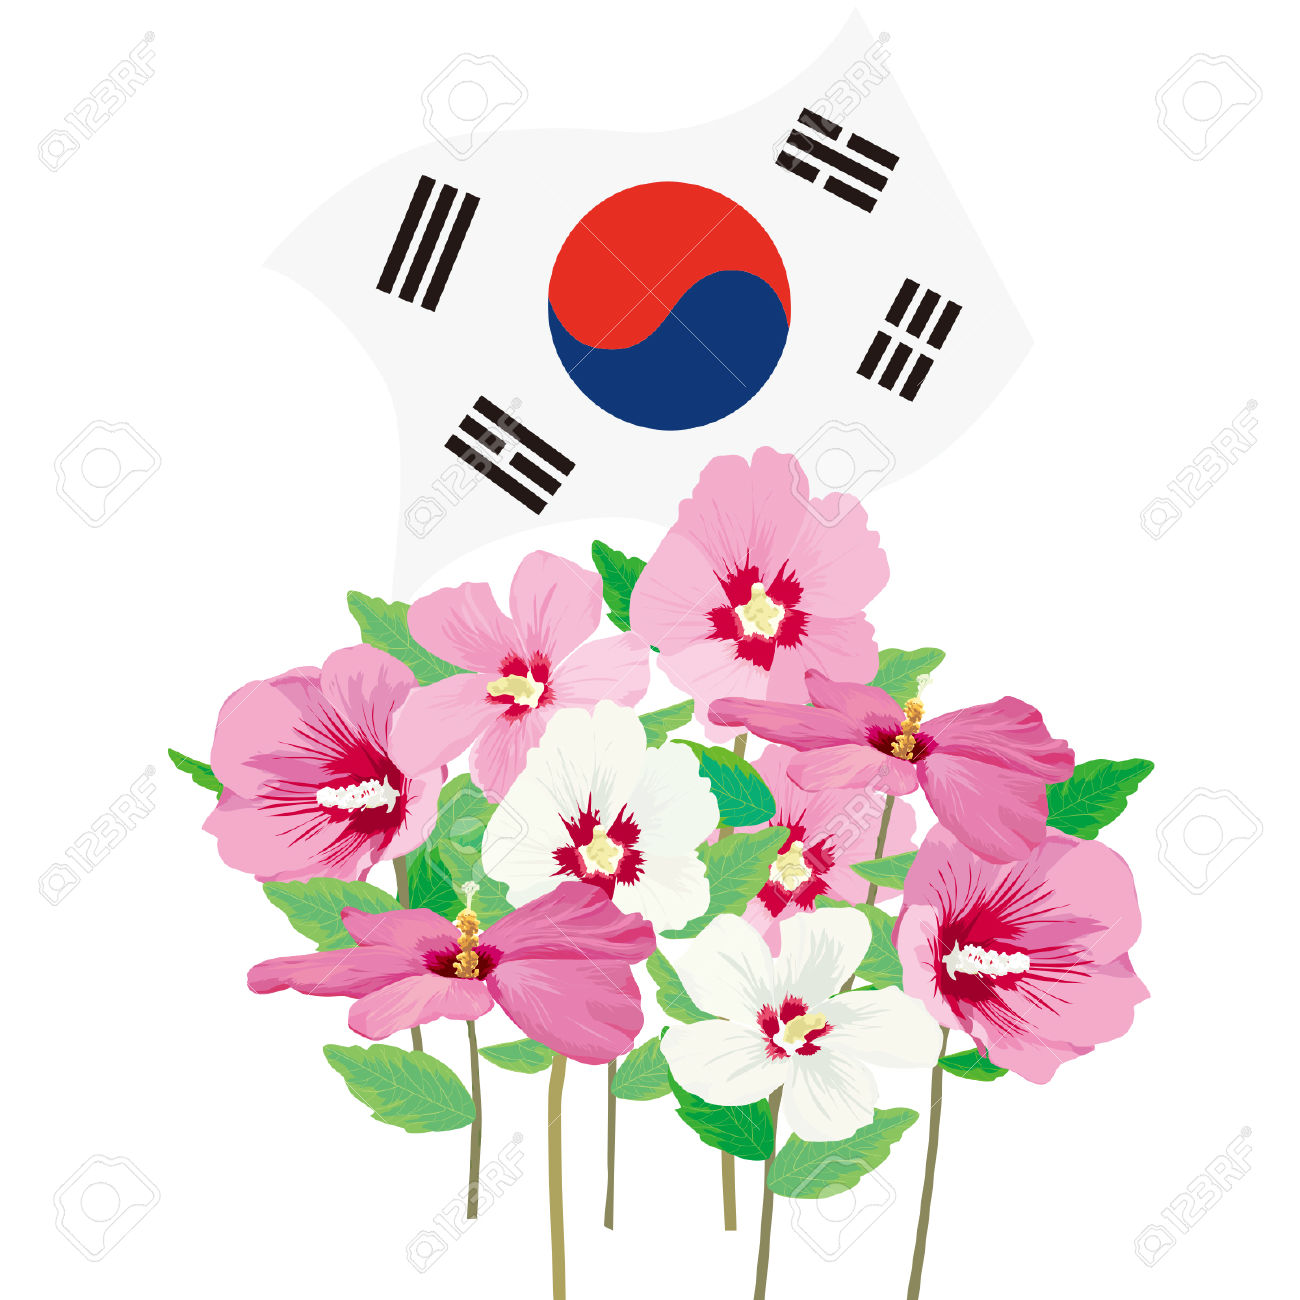 6,538 Korean Flag Stock Vector Illustration And Royalty Free.